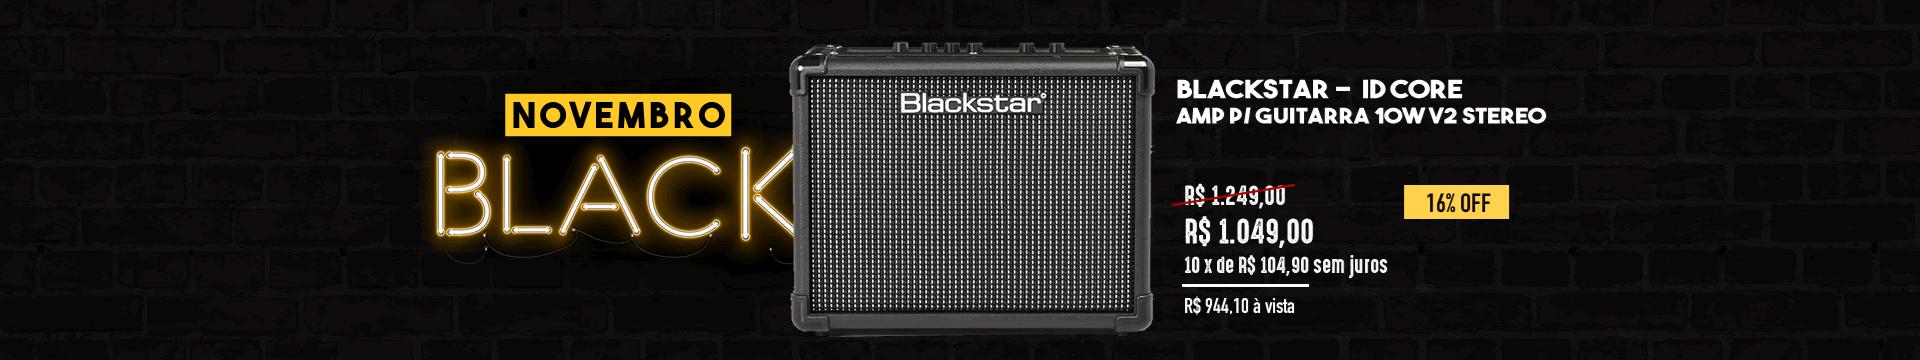 Blackstar IDcore 10